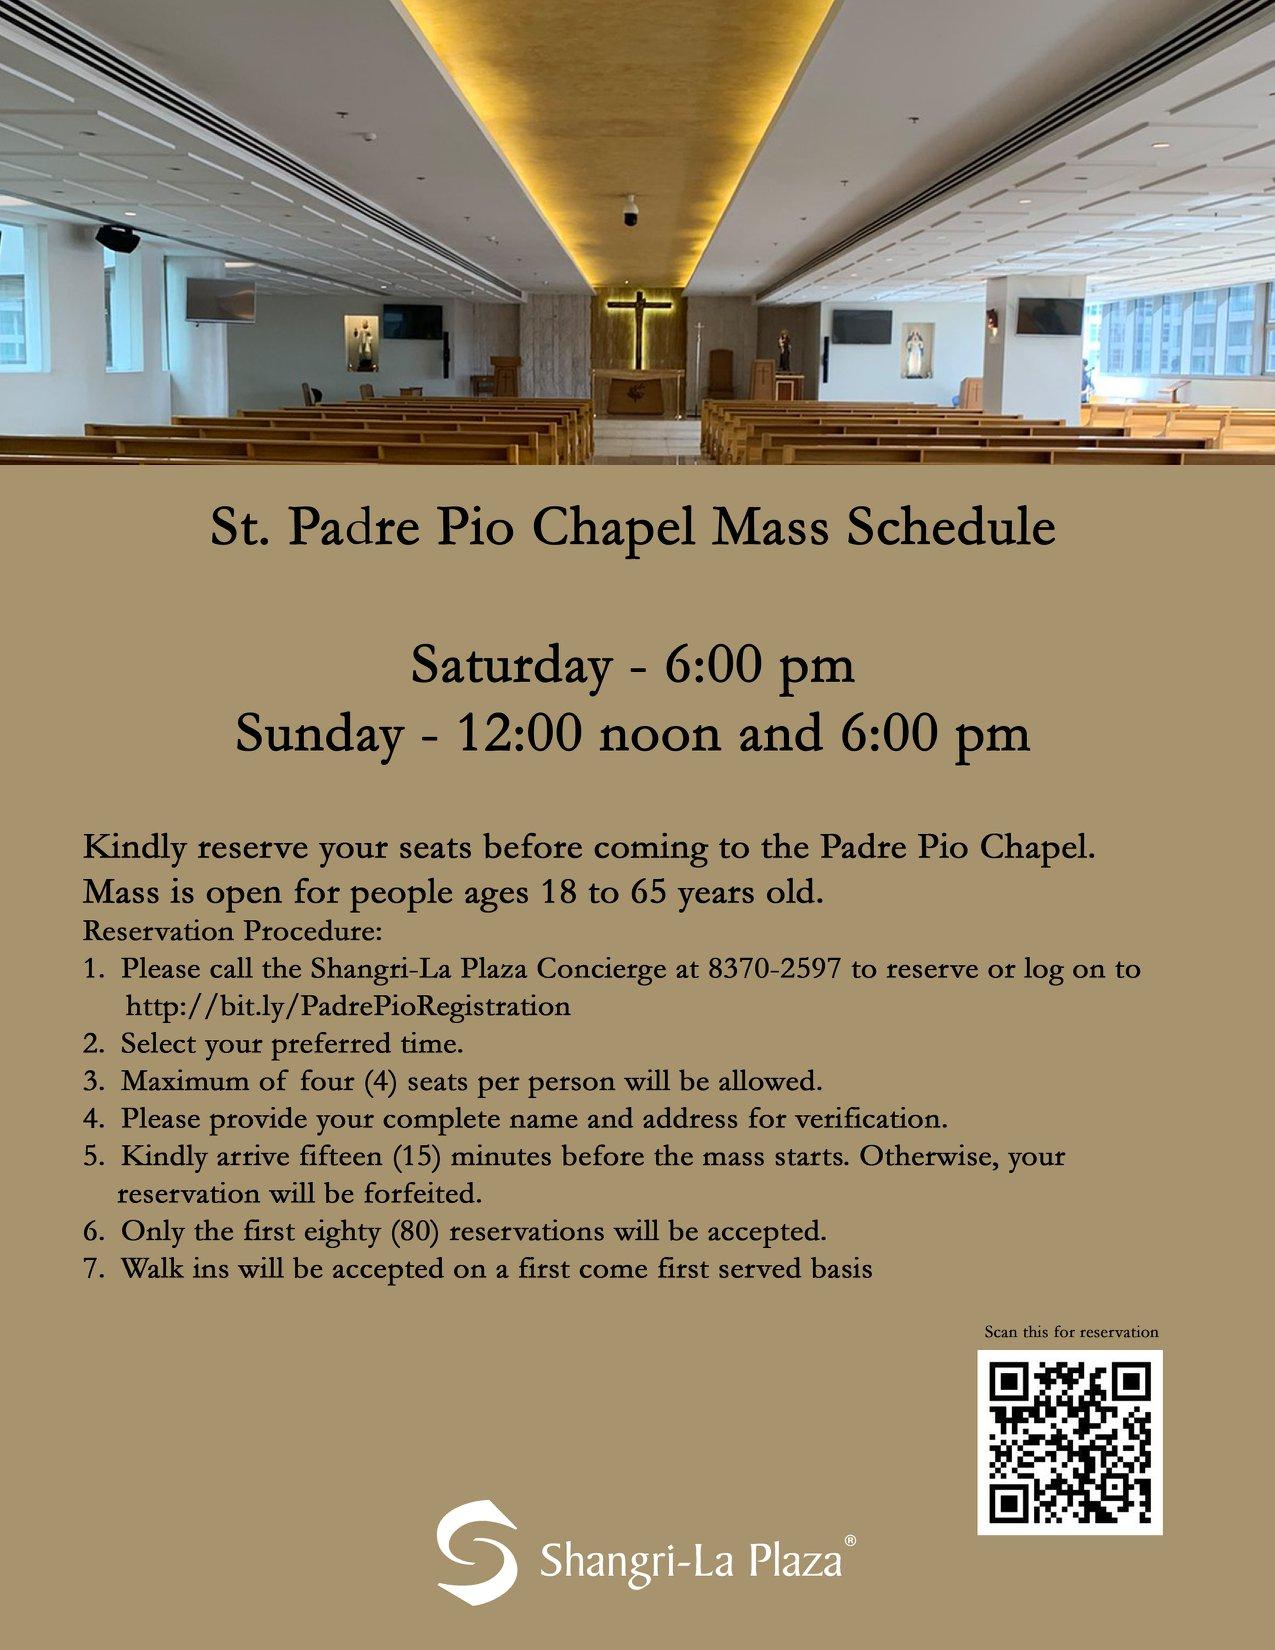 Saint Padre Pio Chapel